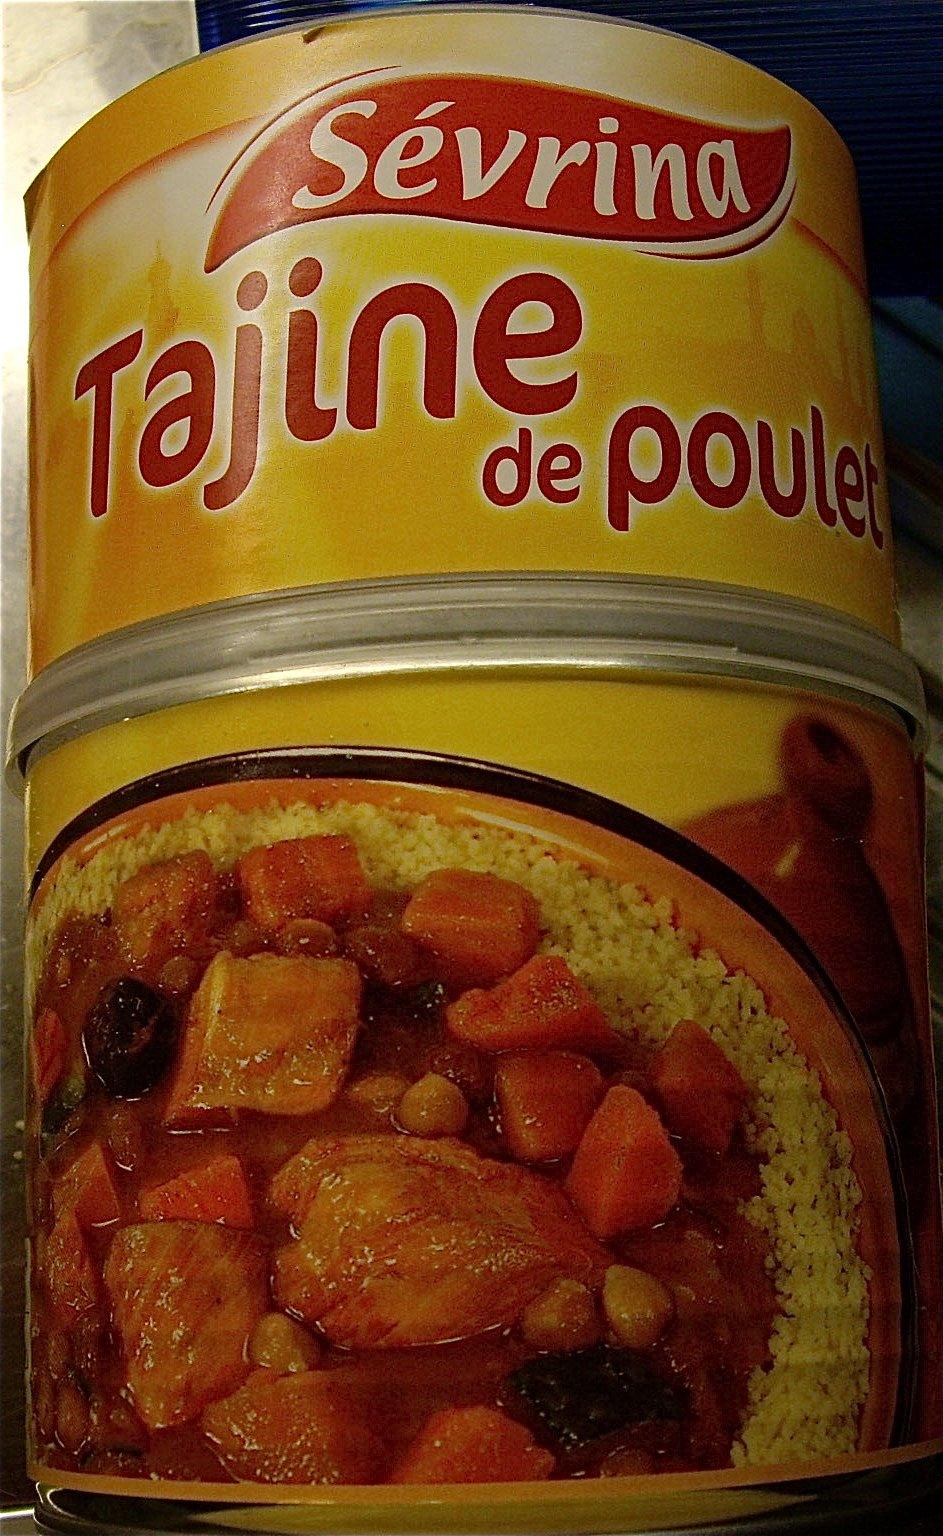 Enjoy - Food & Travel: Sévrina Tajine de Poulet - hardly a ...